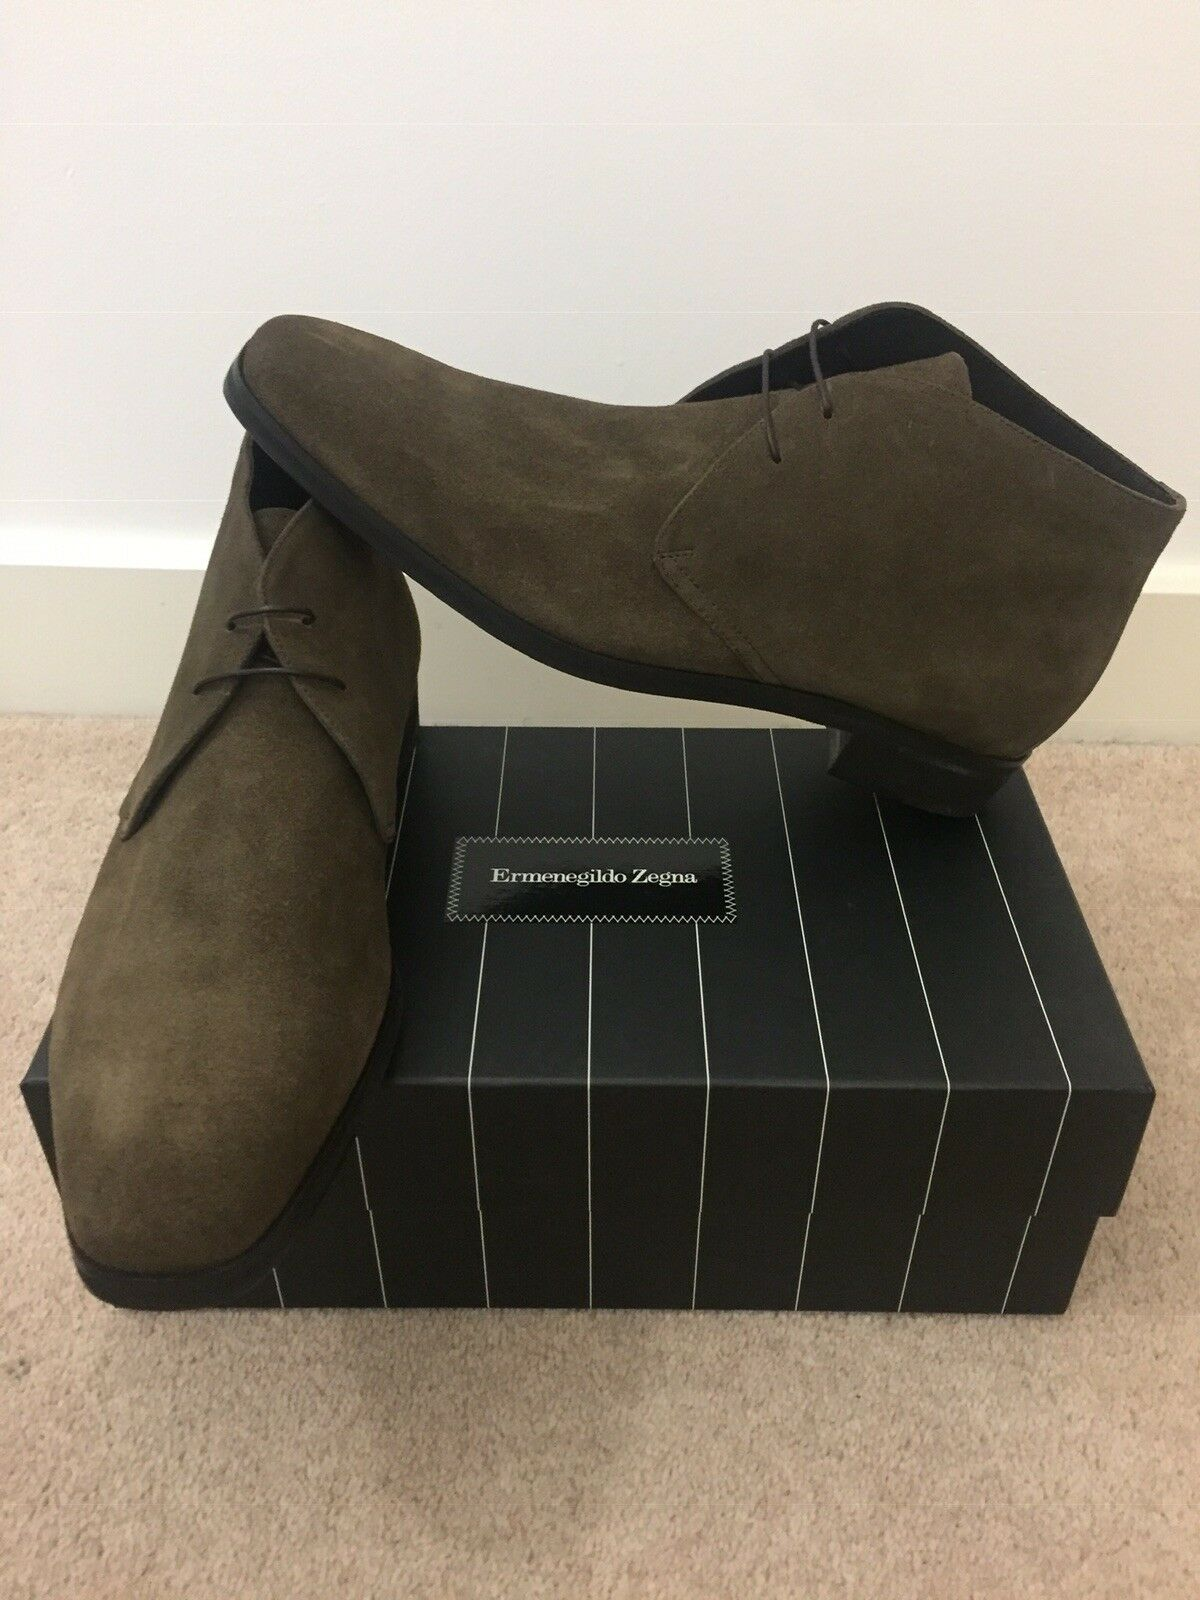 Ermenegildo Zegna Dark gris Suede Desert bota 10(44)BNWB  Selling